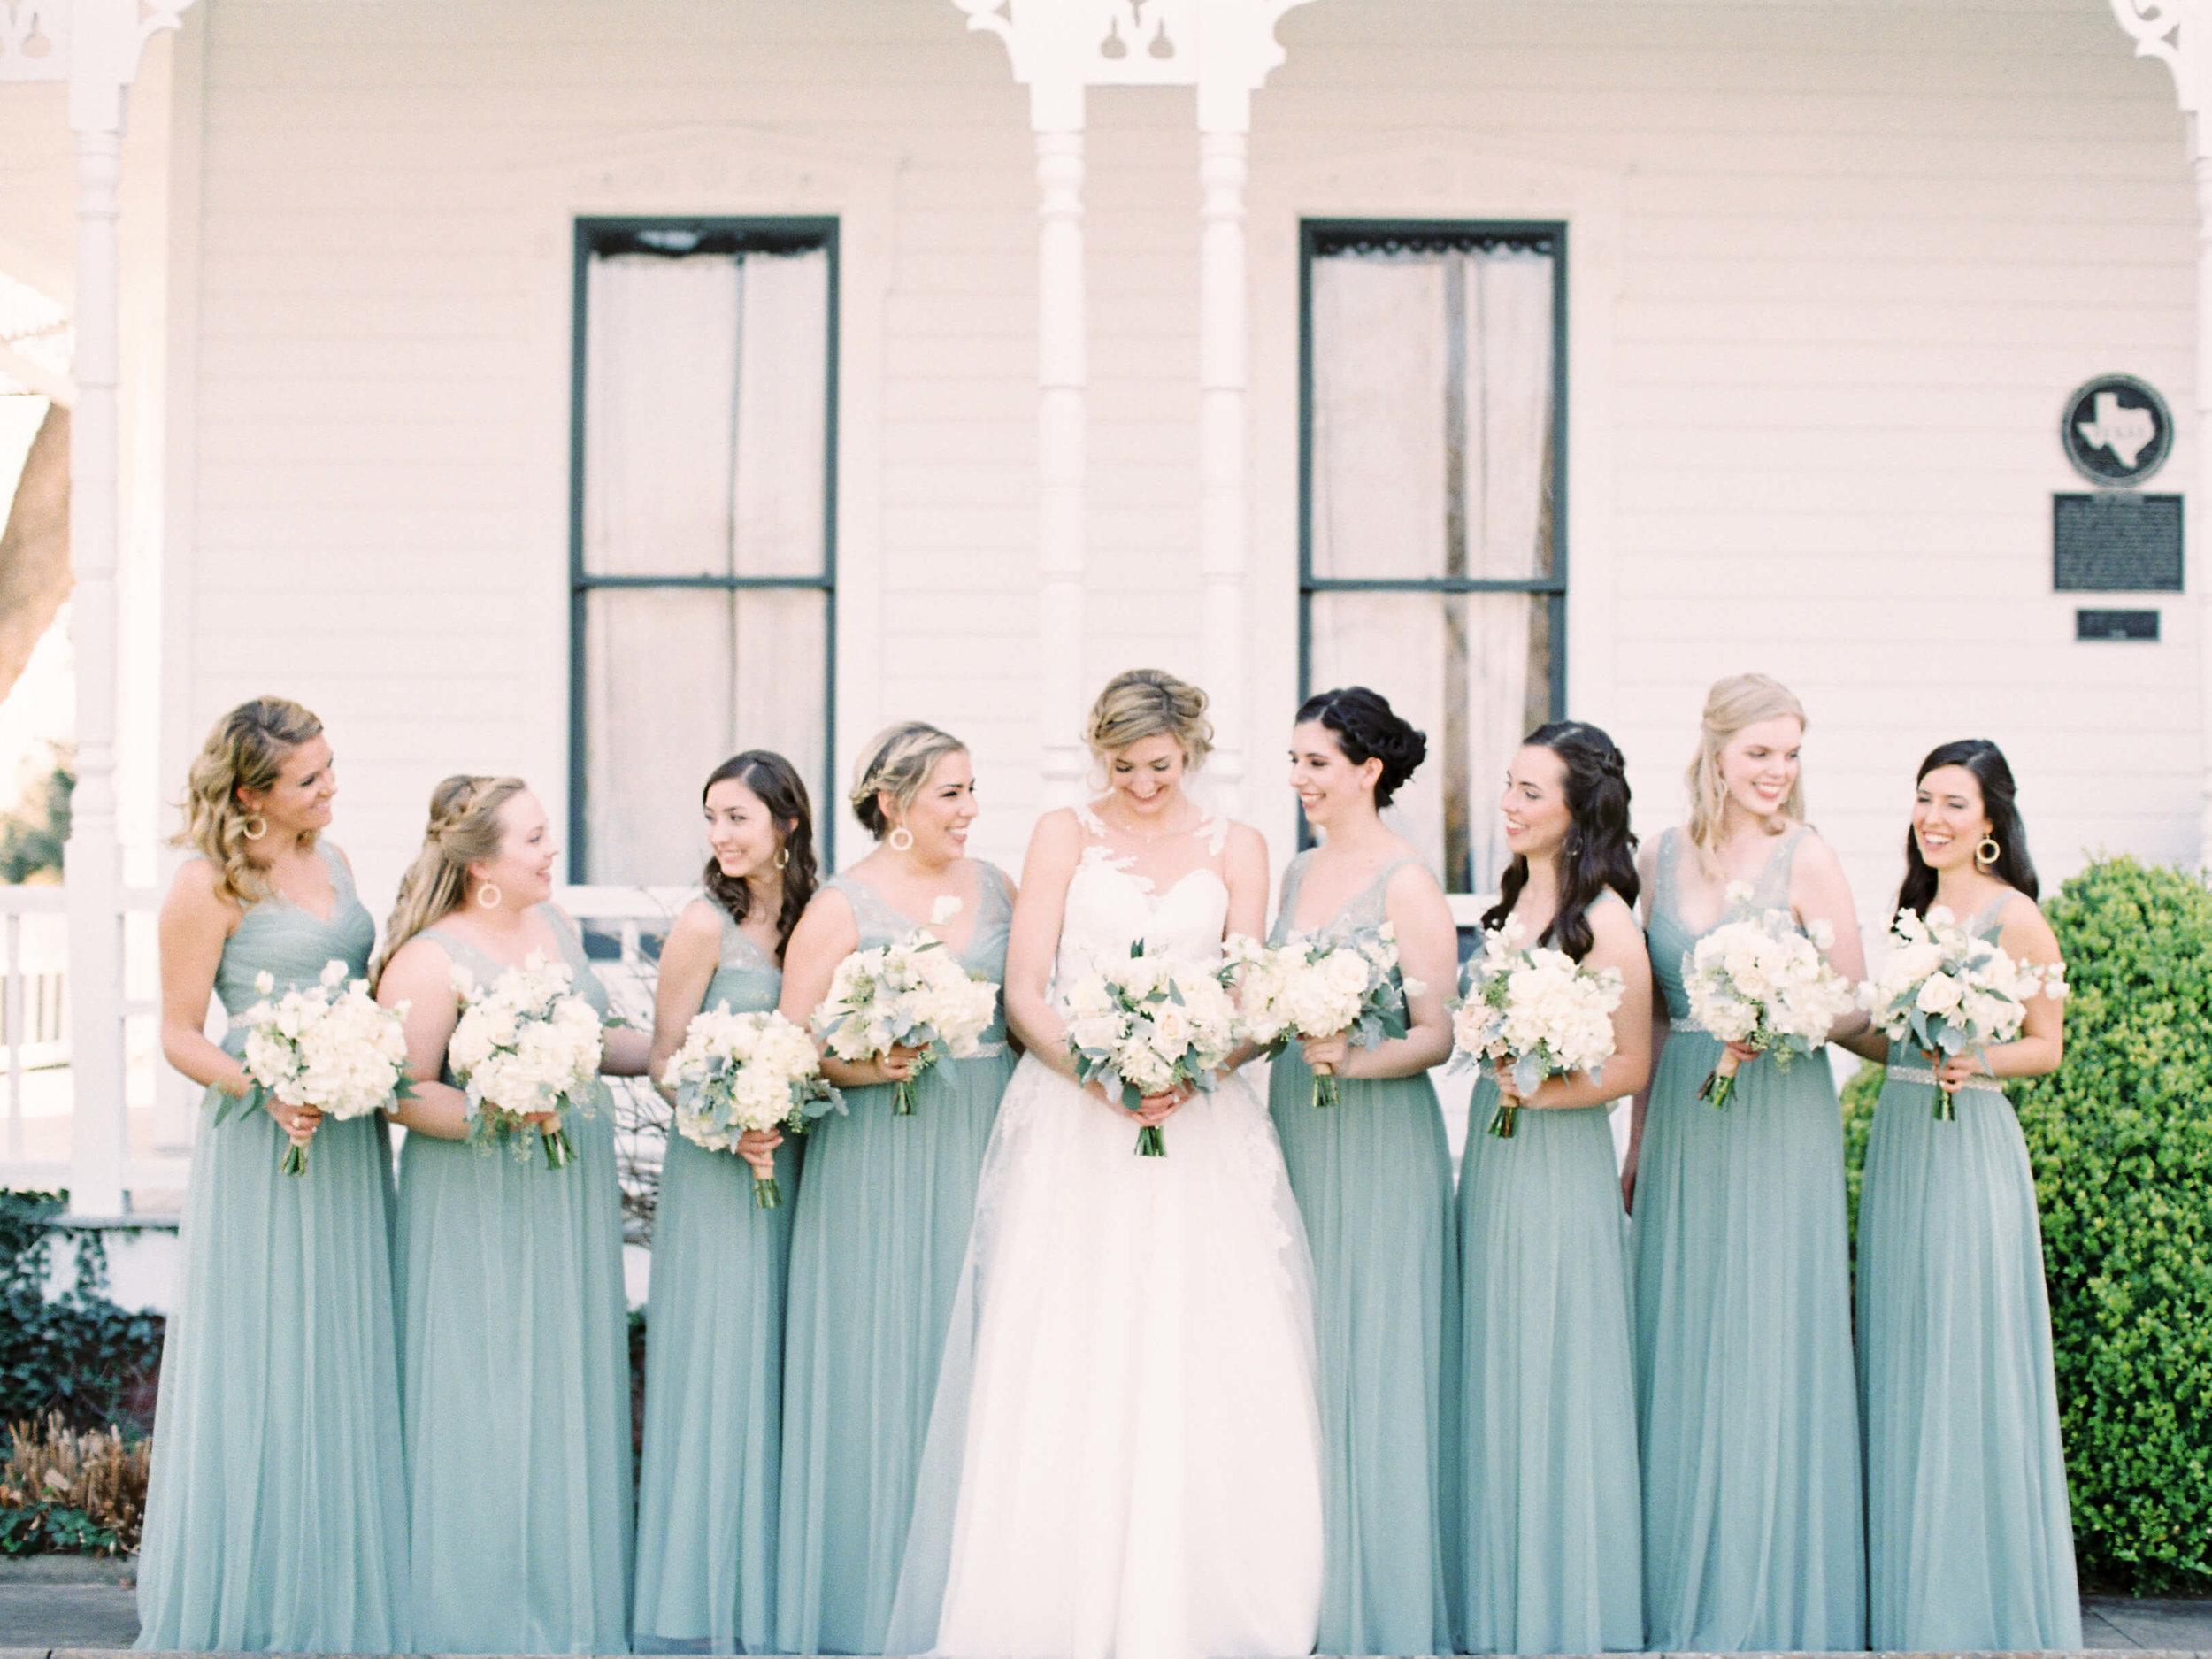 keara-william-wedding-149-2.jpg